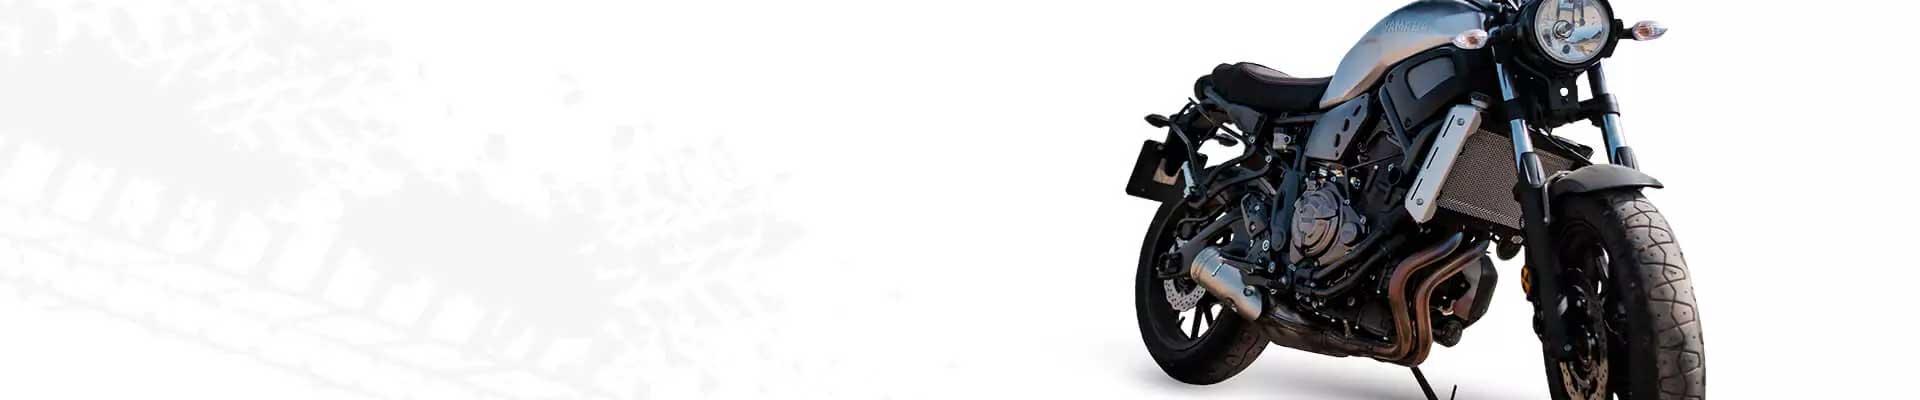 roadster-insurance